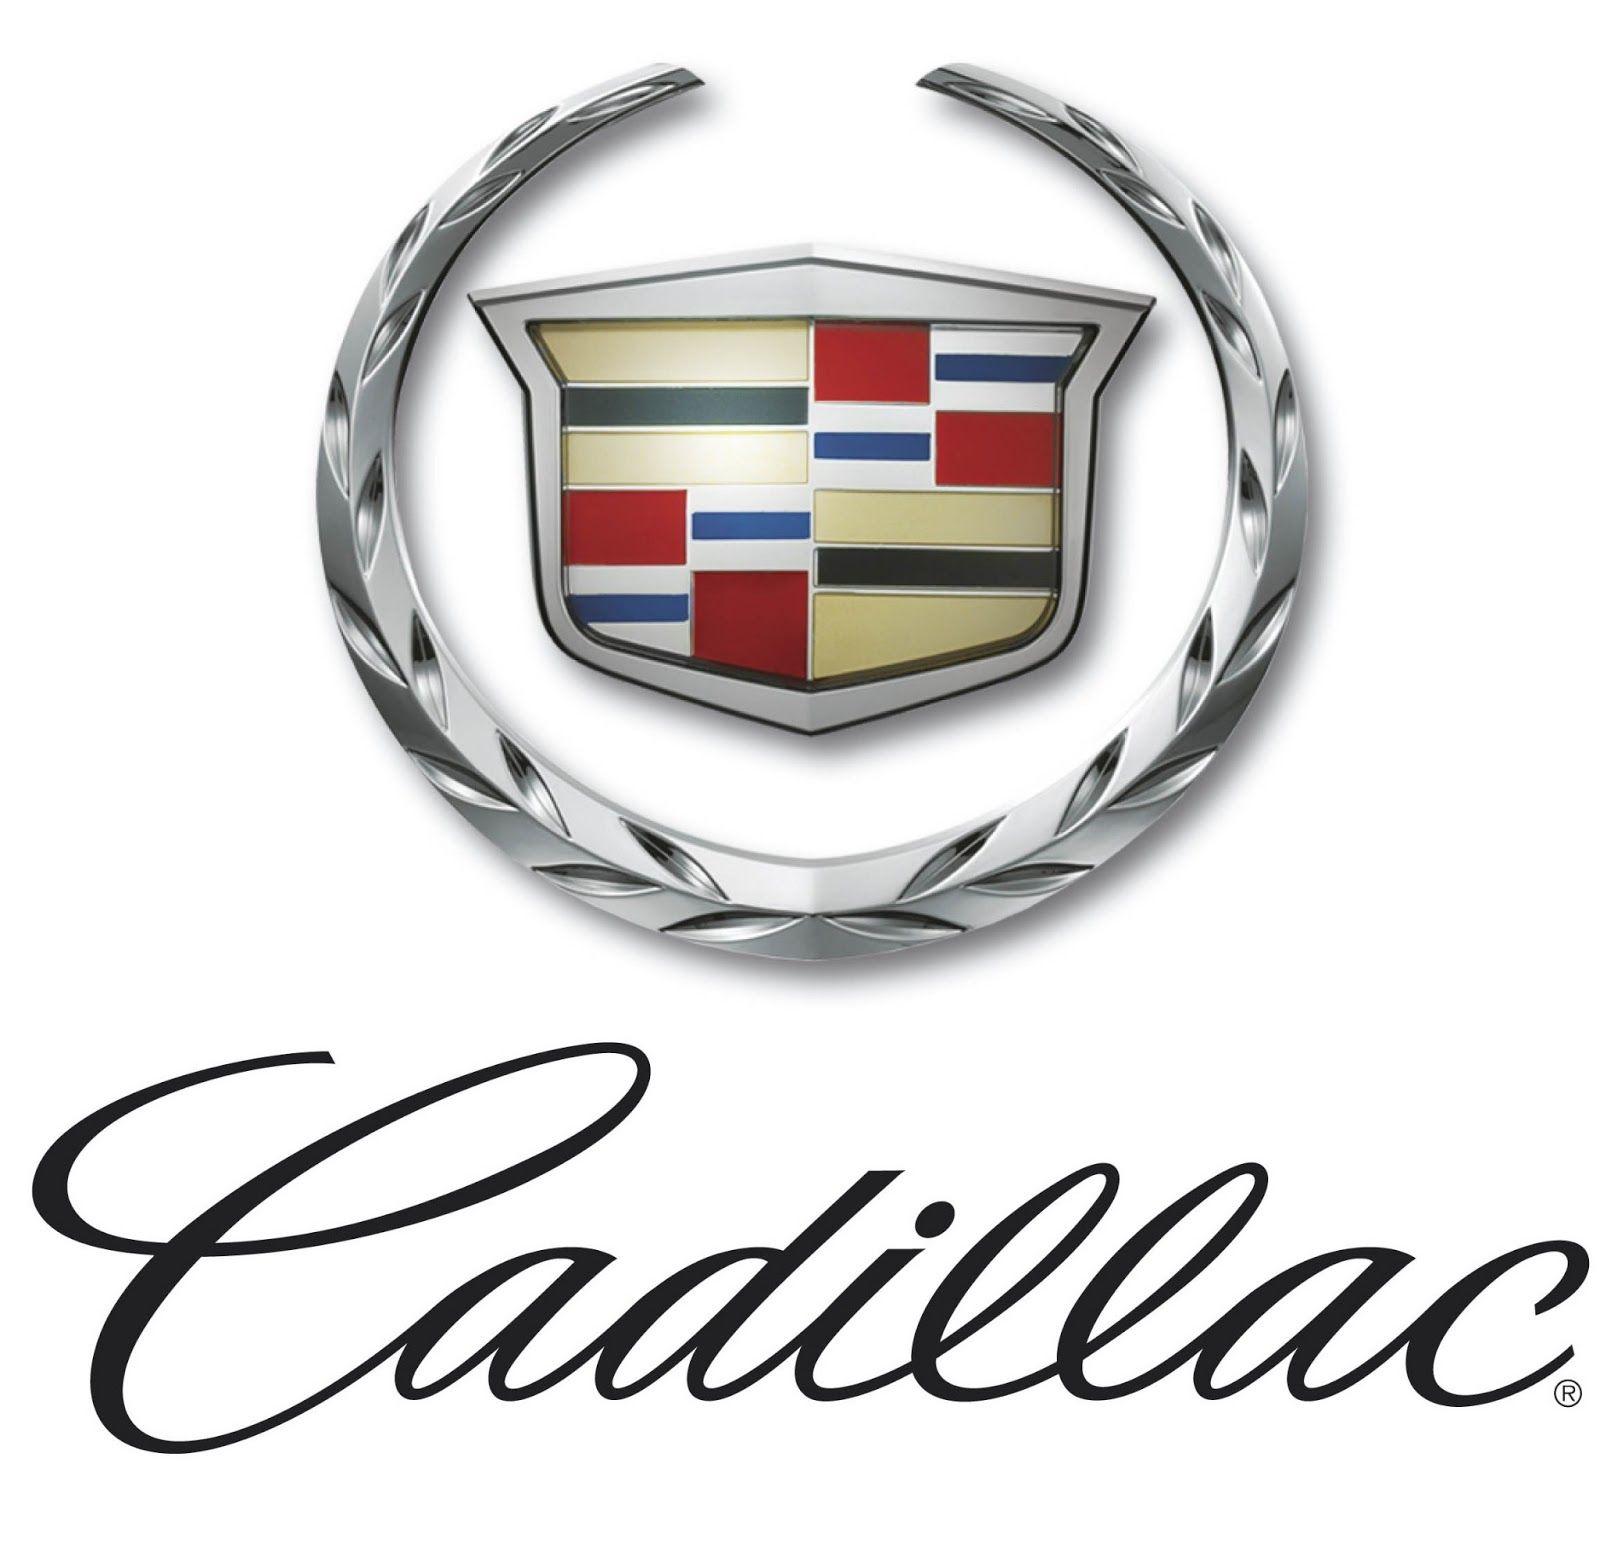 Cadillac Logo Vector Cadillac Logo History Places to